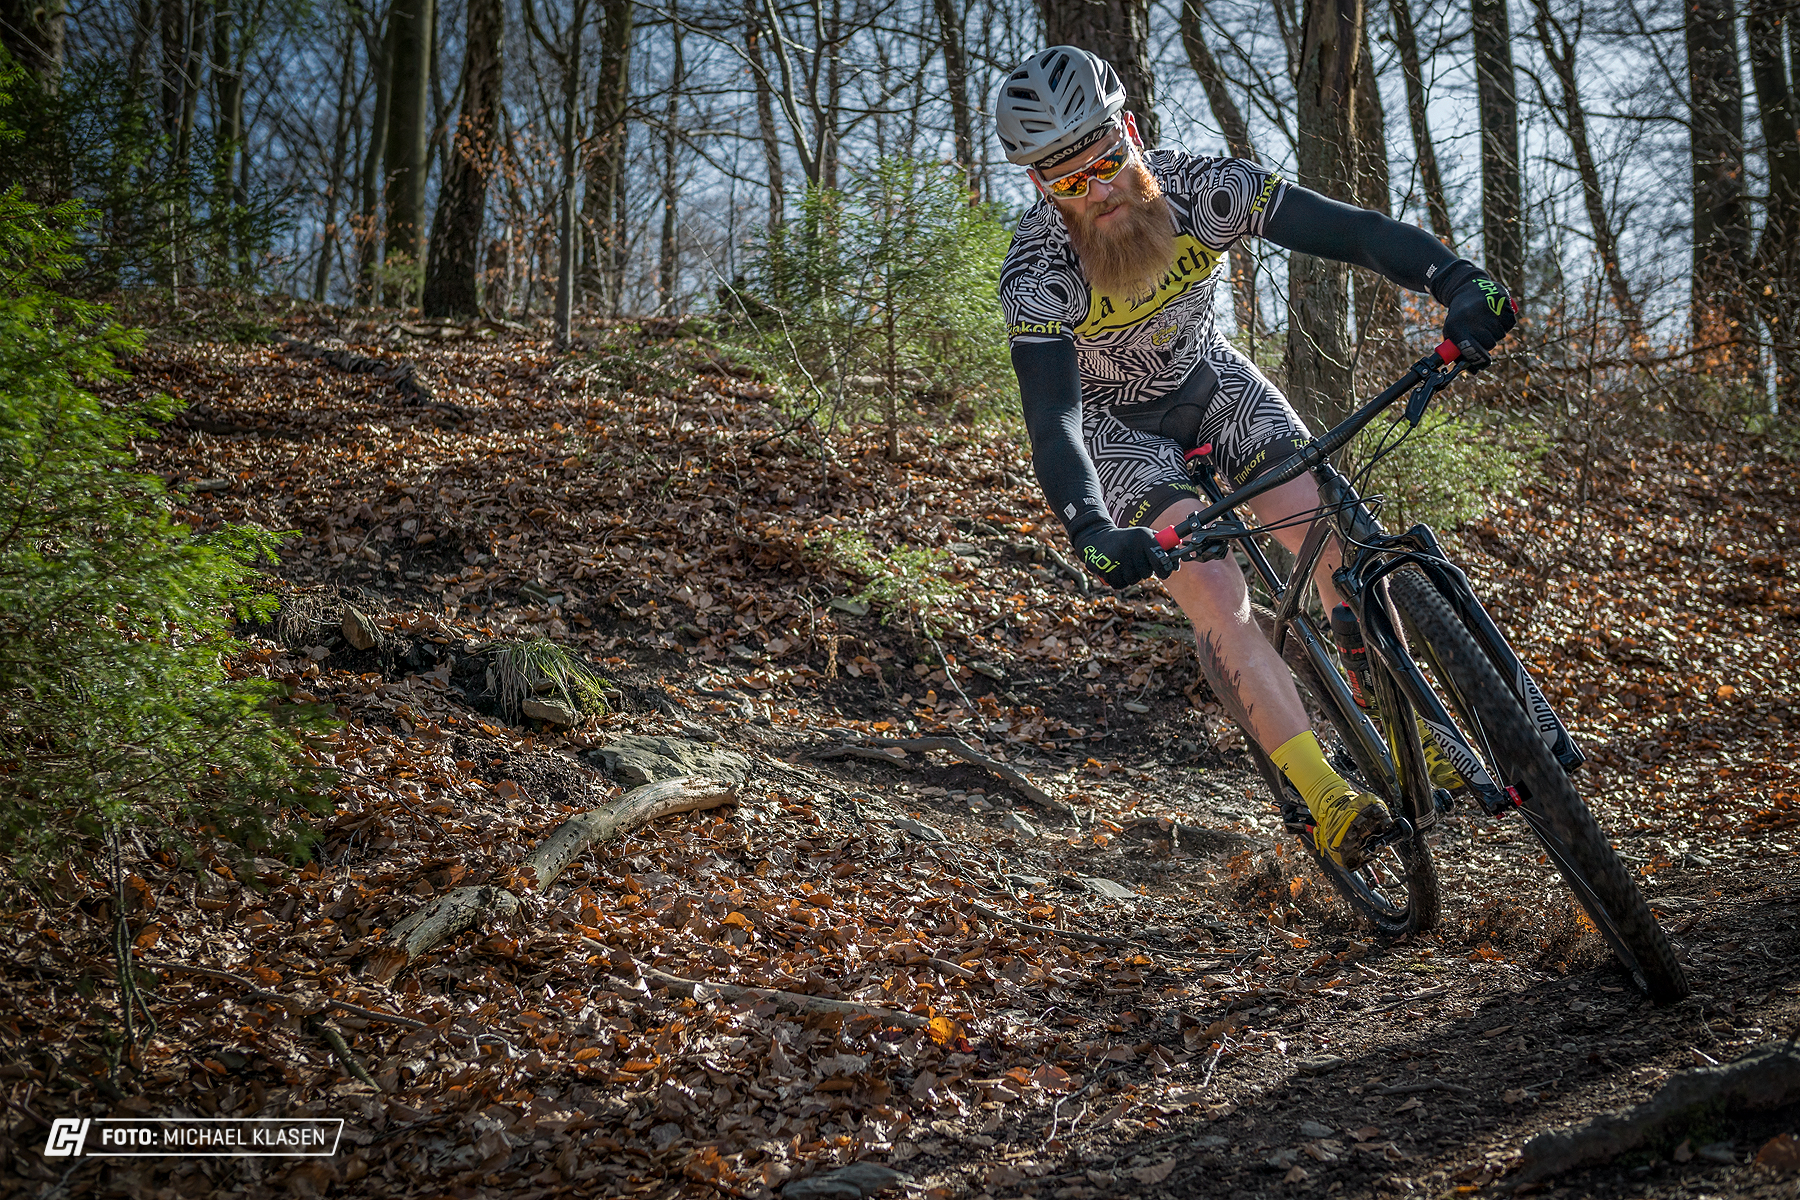 MIK 8319 Cycleholix